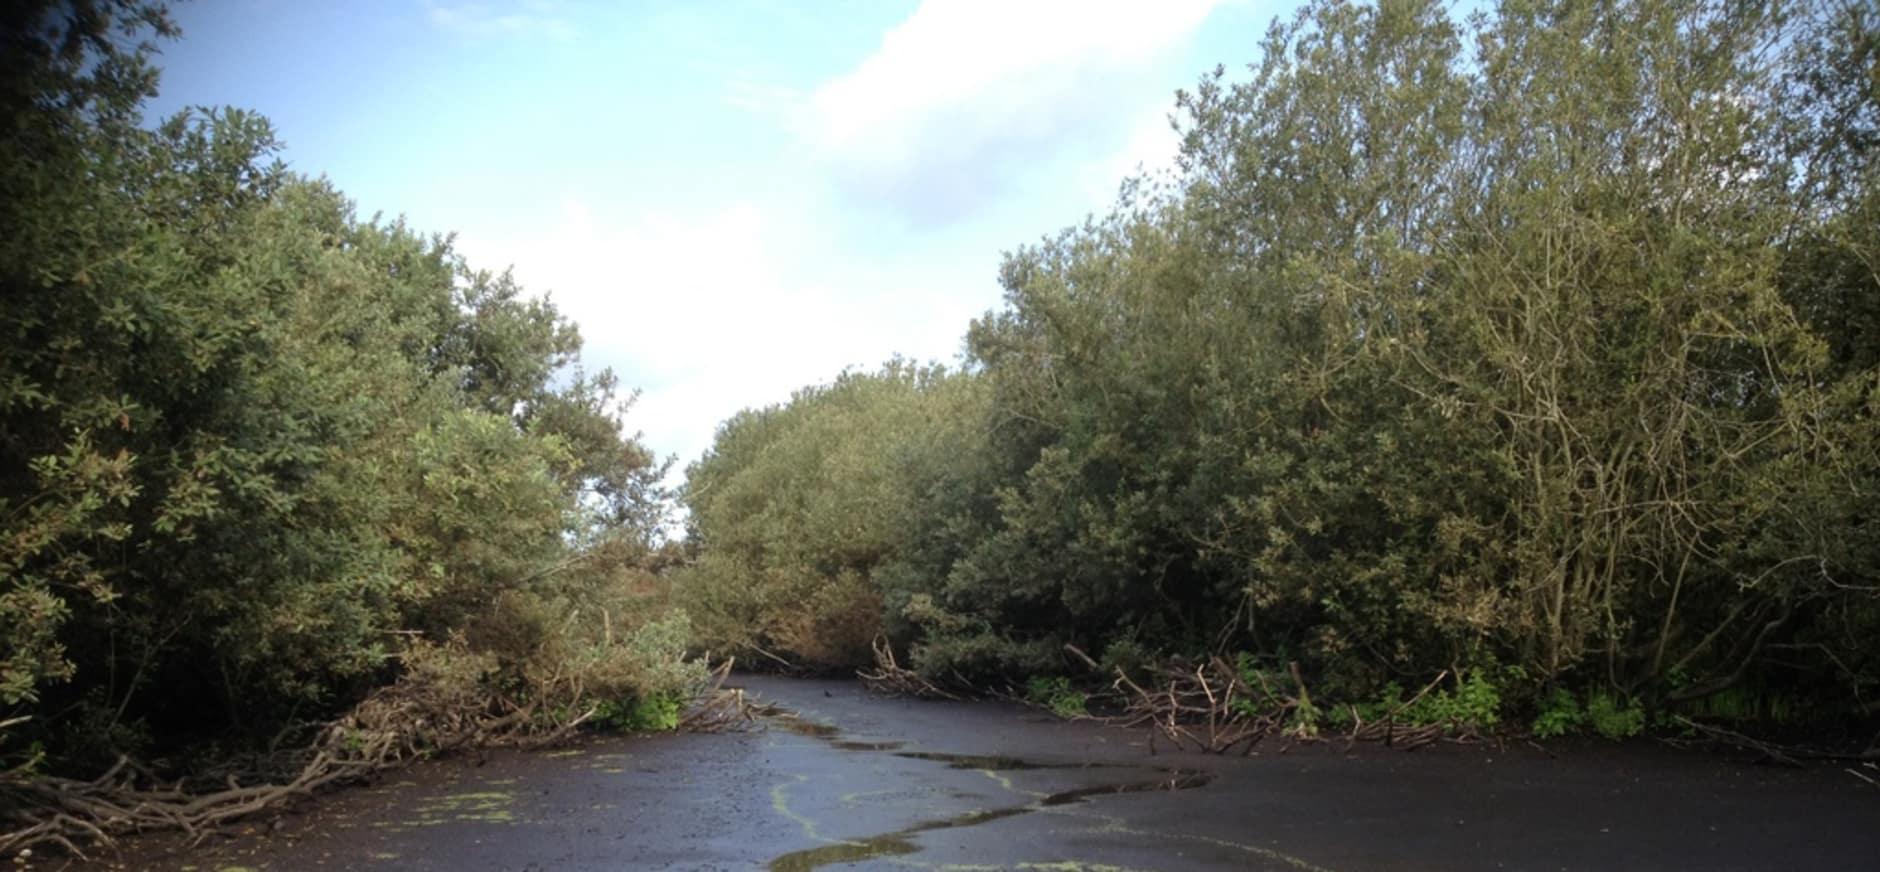 Nestentelling Quackjeswater levert 270 lepelaarsnesten op